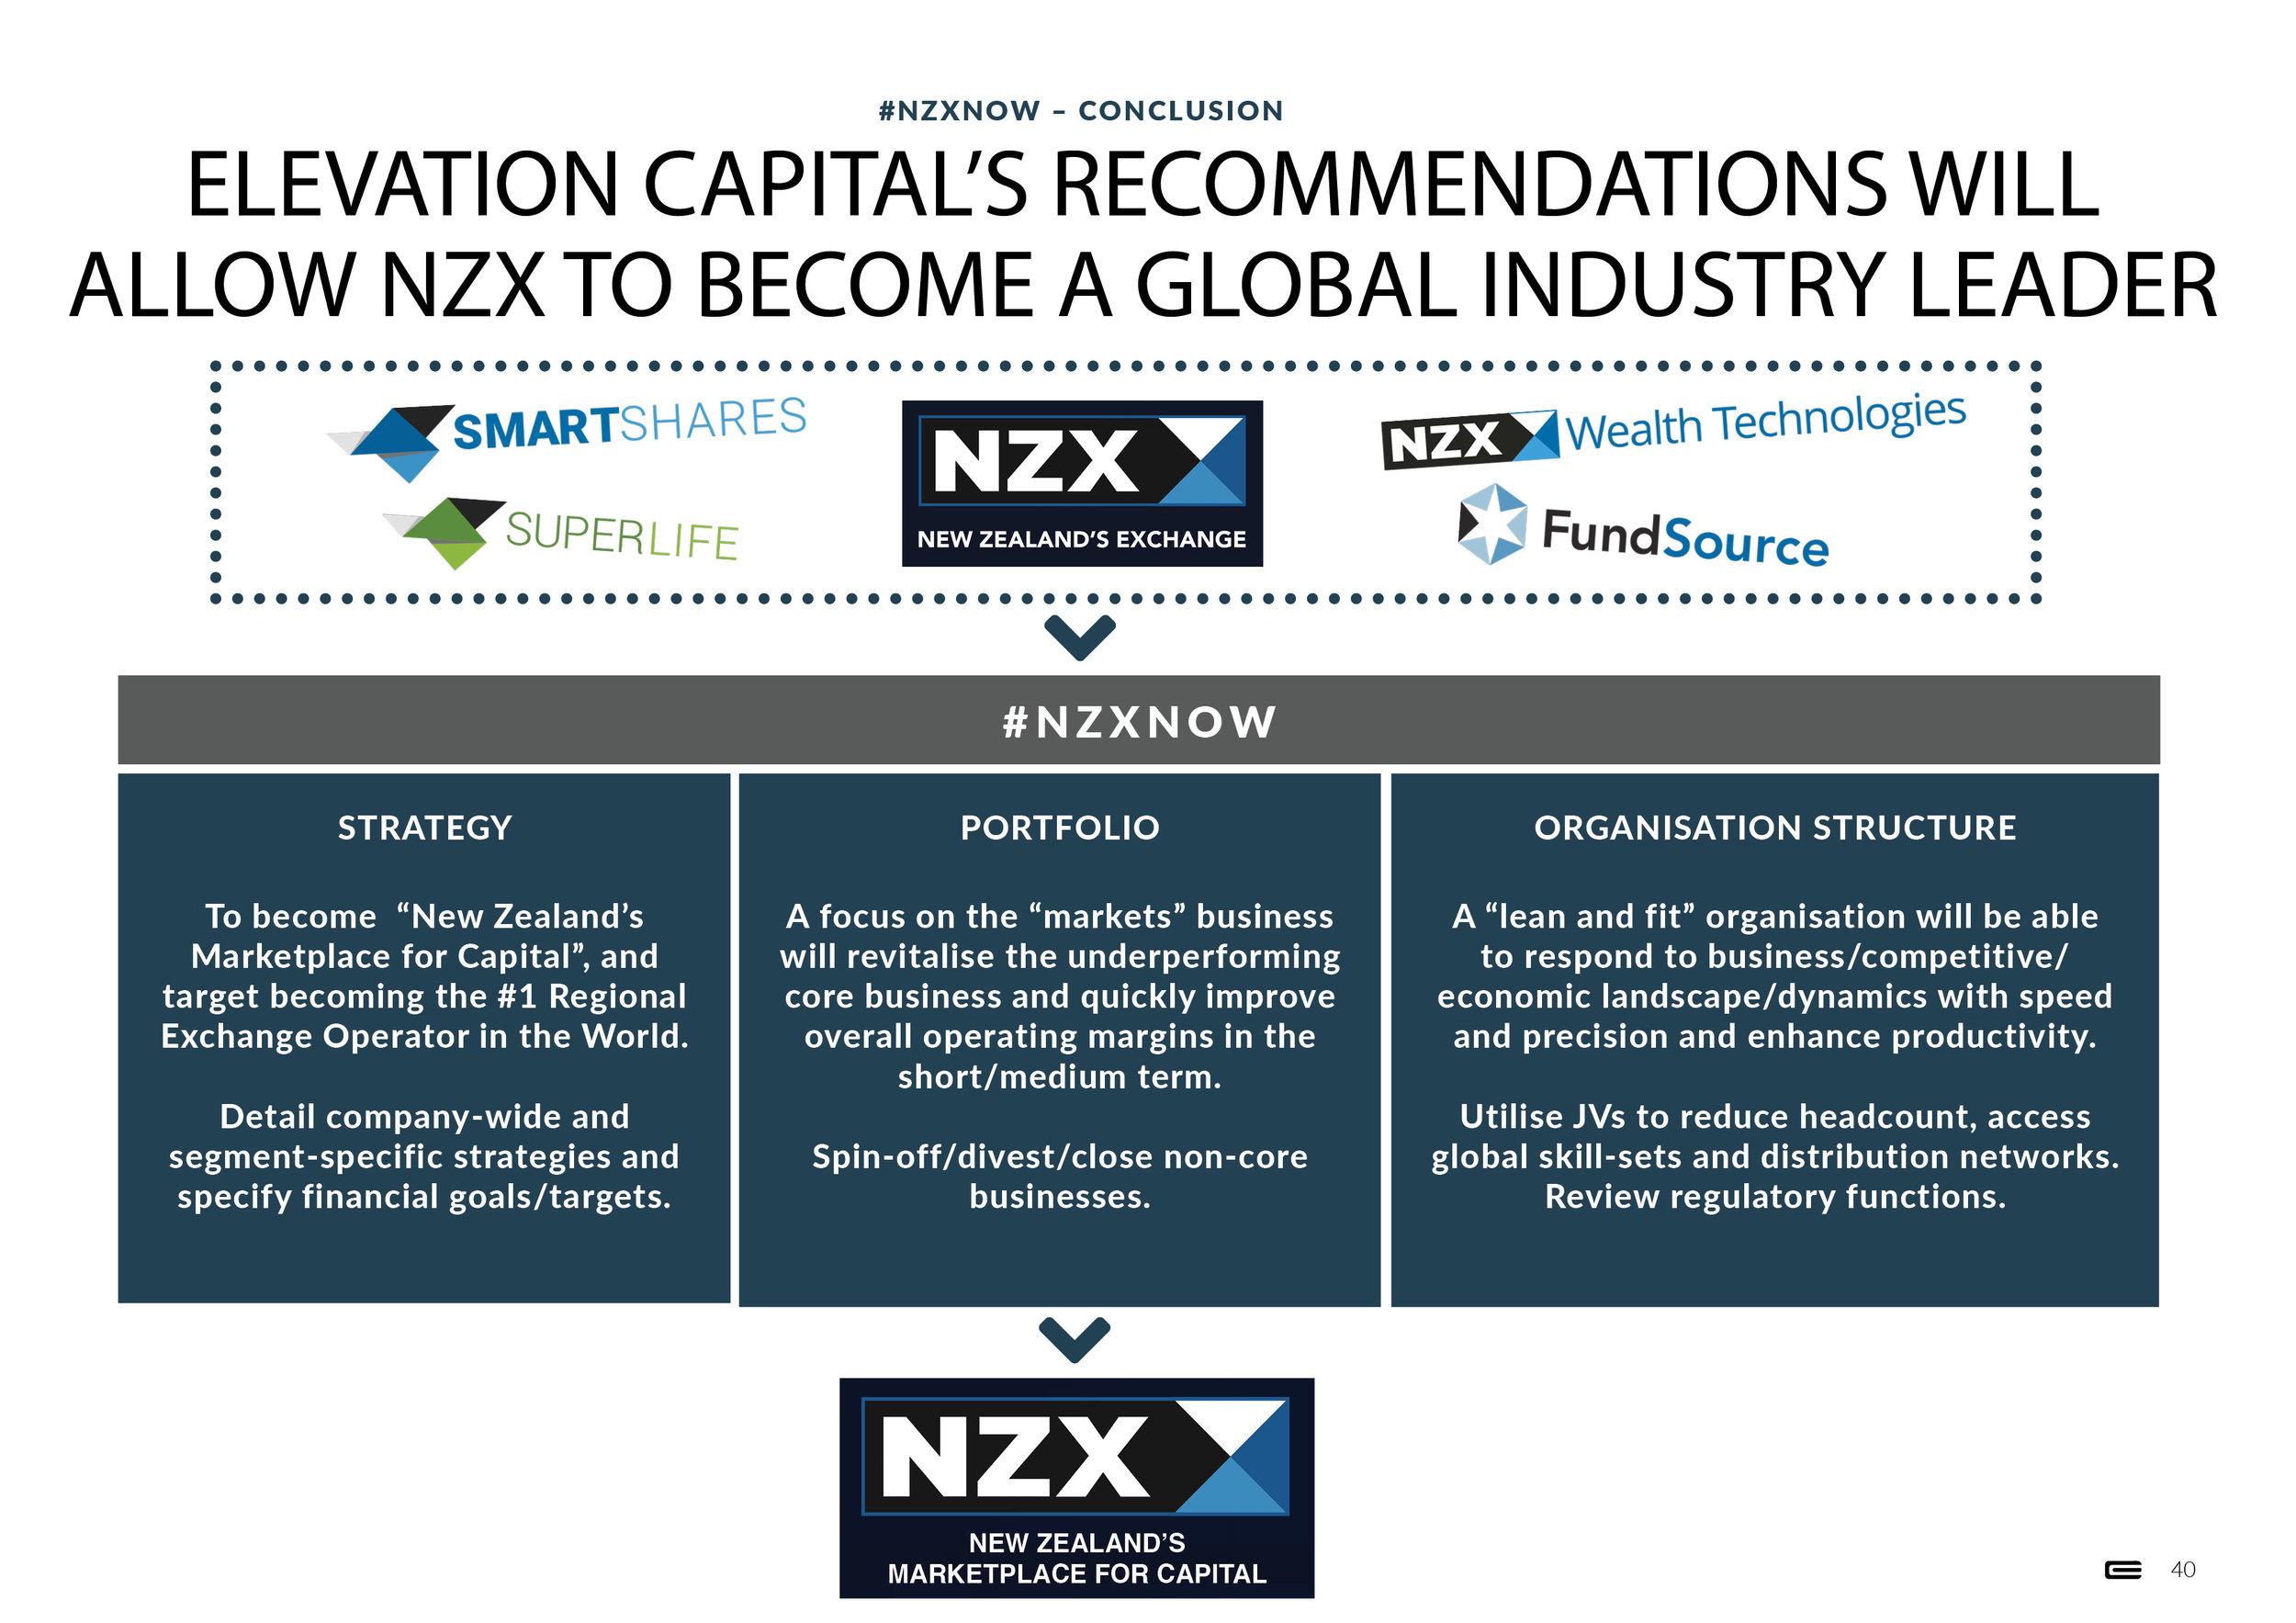 #NZXNOW - Presentation - 1 October 201840.jpg